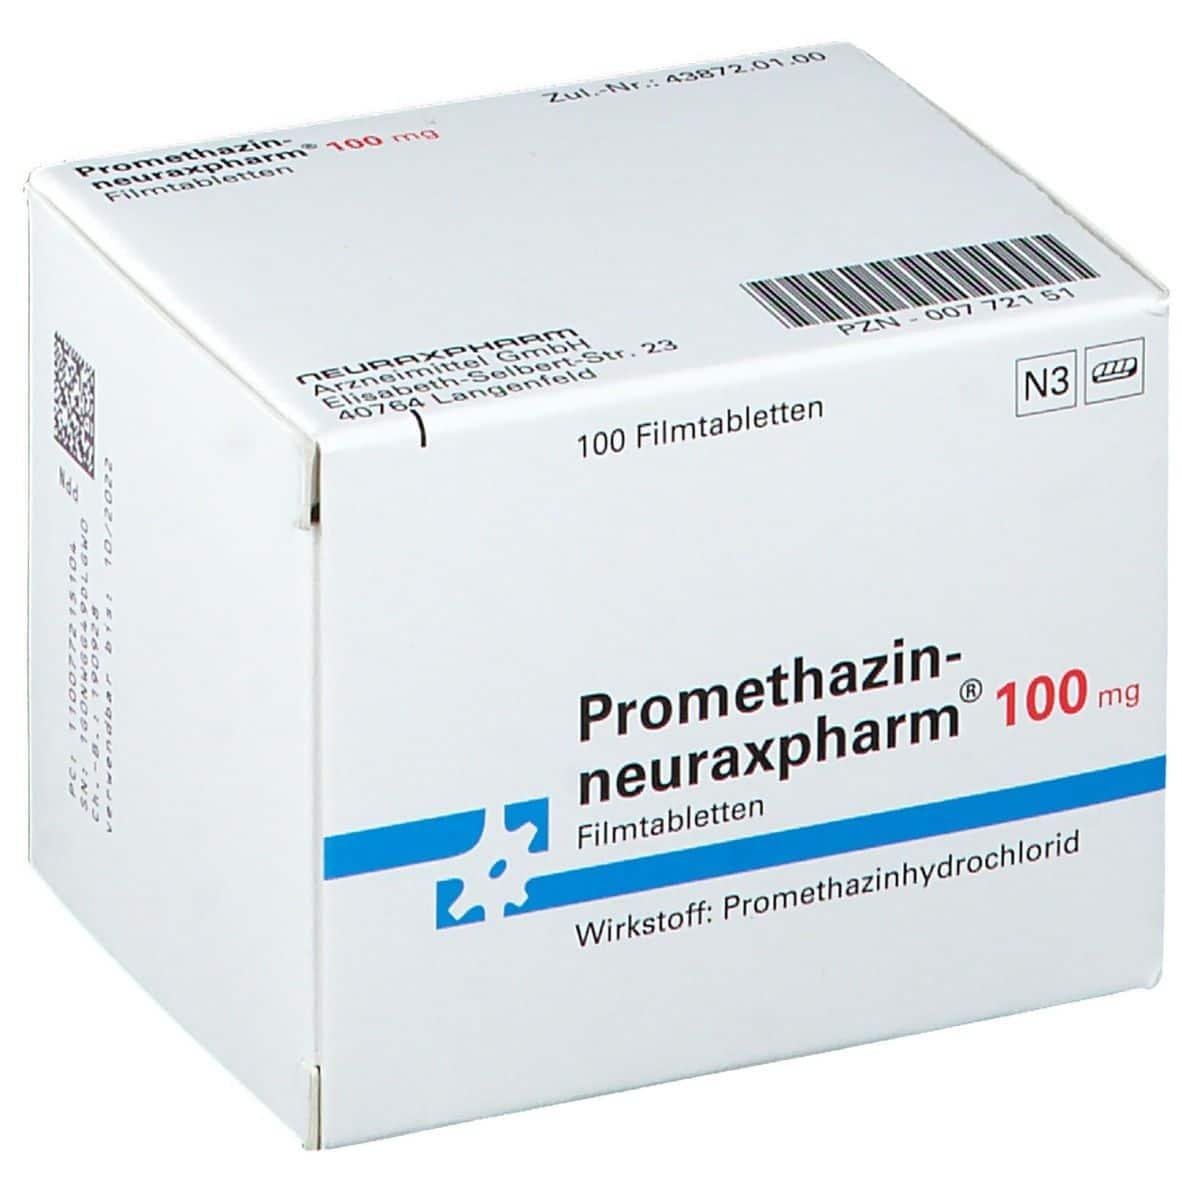 promethazin neuraxpharm